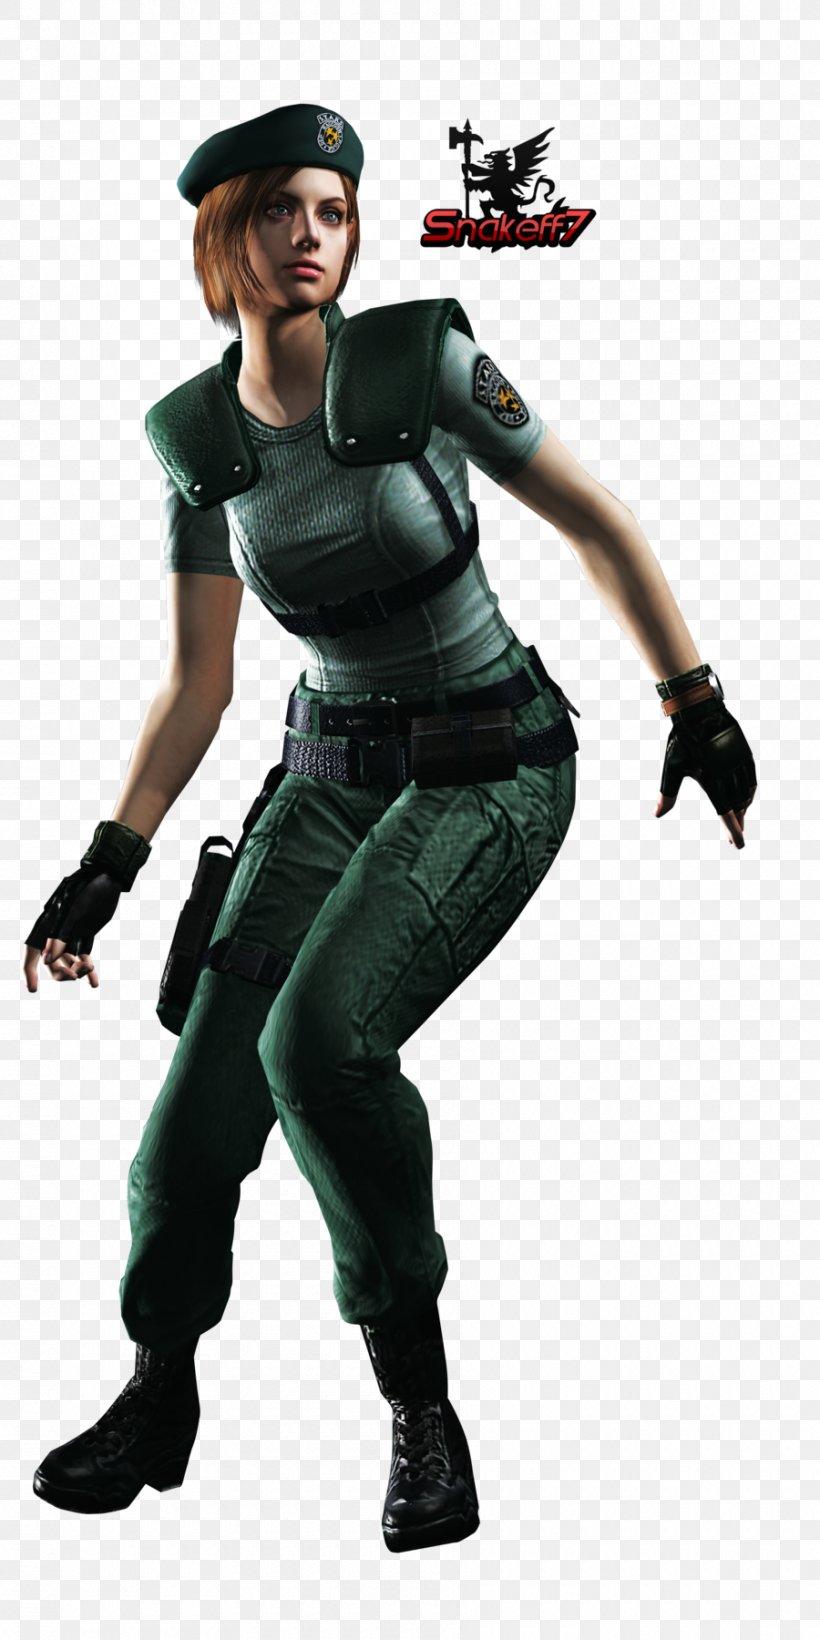 Resident Evil 5 Resident Evil 3 Nemesis Resident Evil